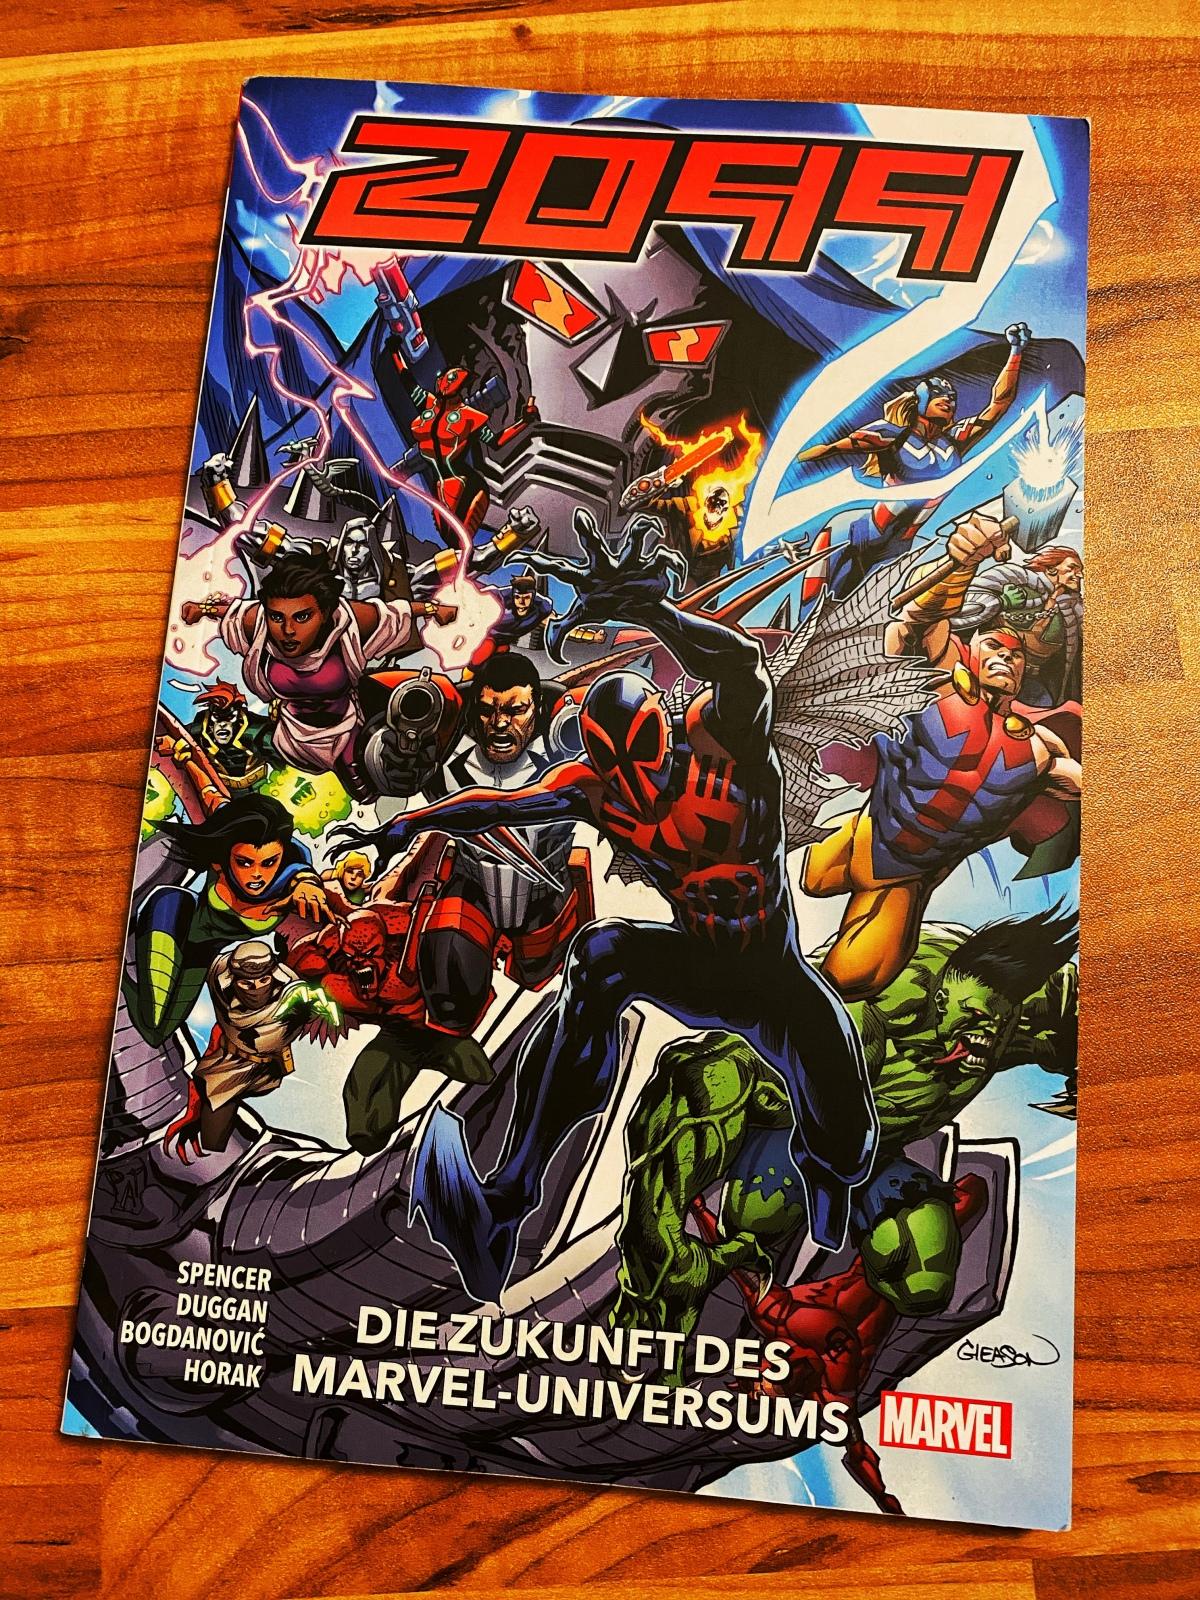 Marvel 2099 Band 1: Die Zukunft des Marvel-Universums | Gedankenspiel [Rezensionsexemplar]